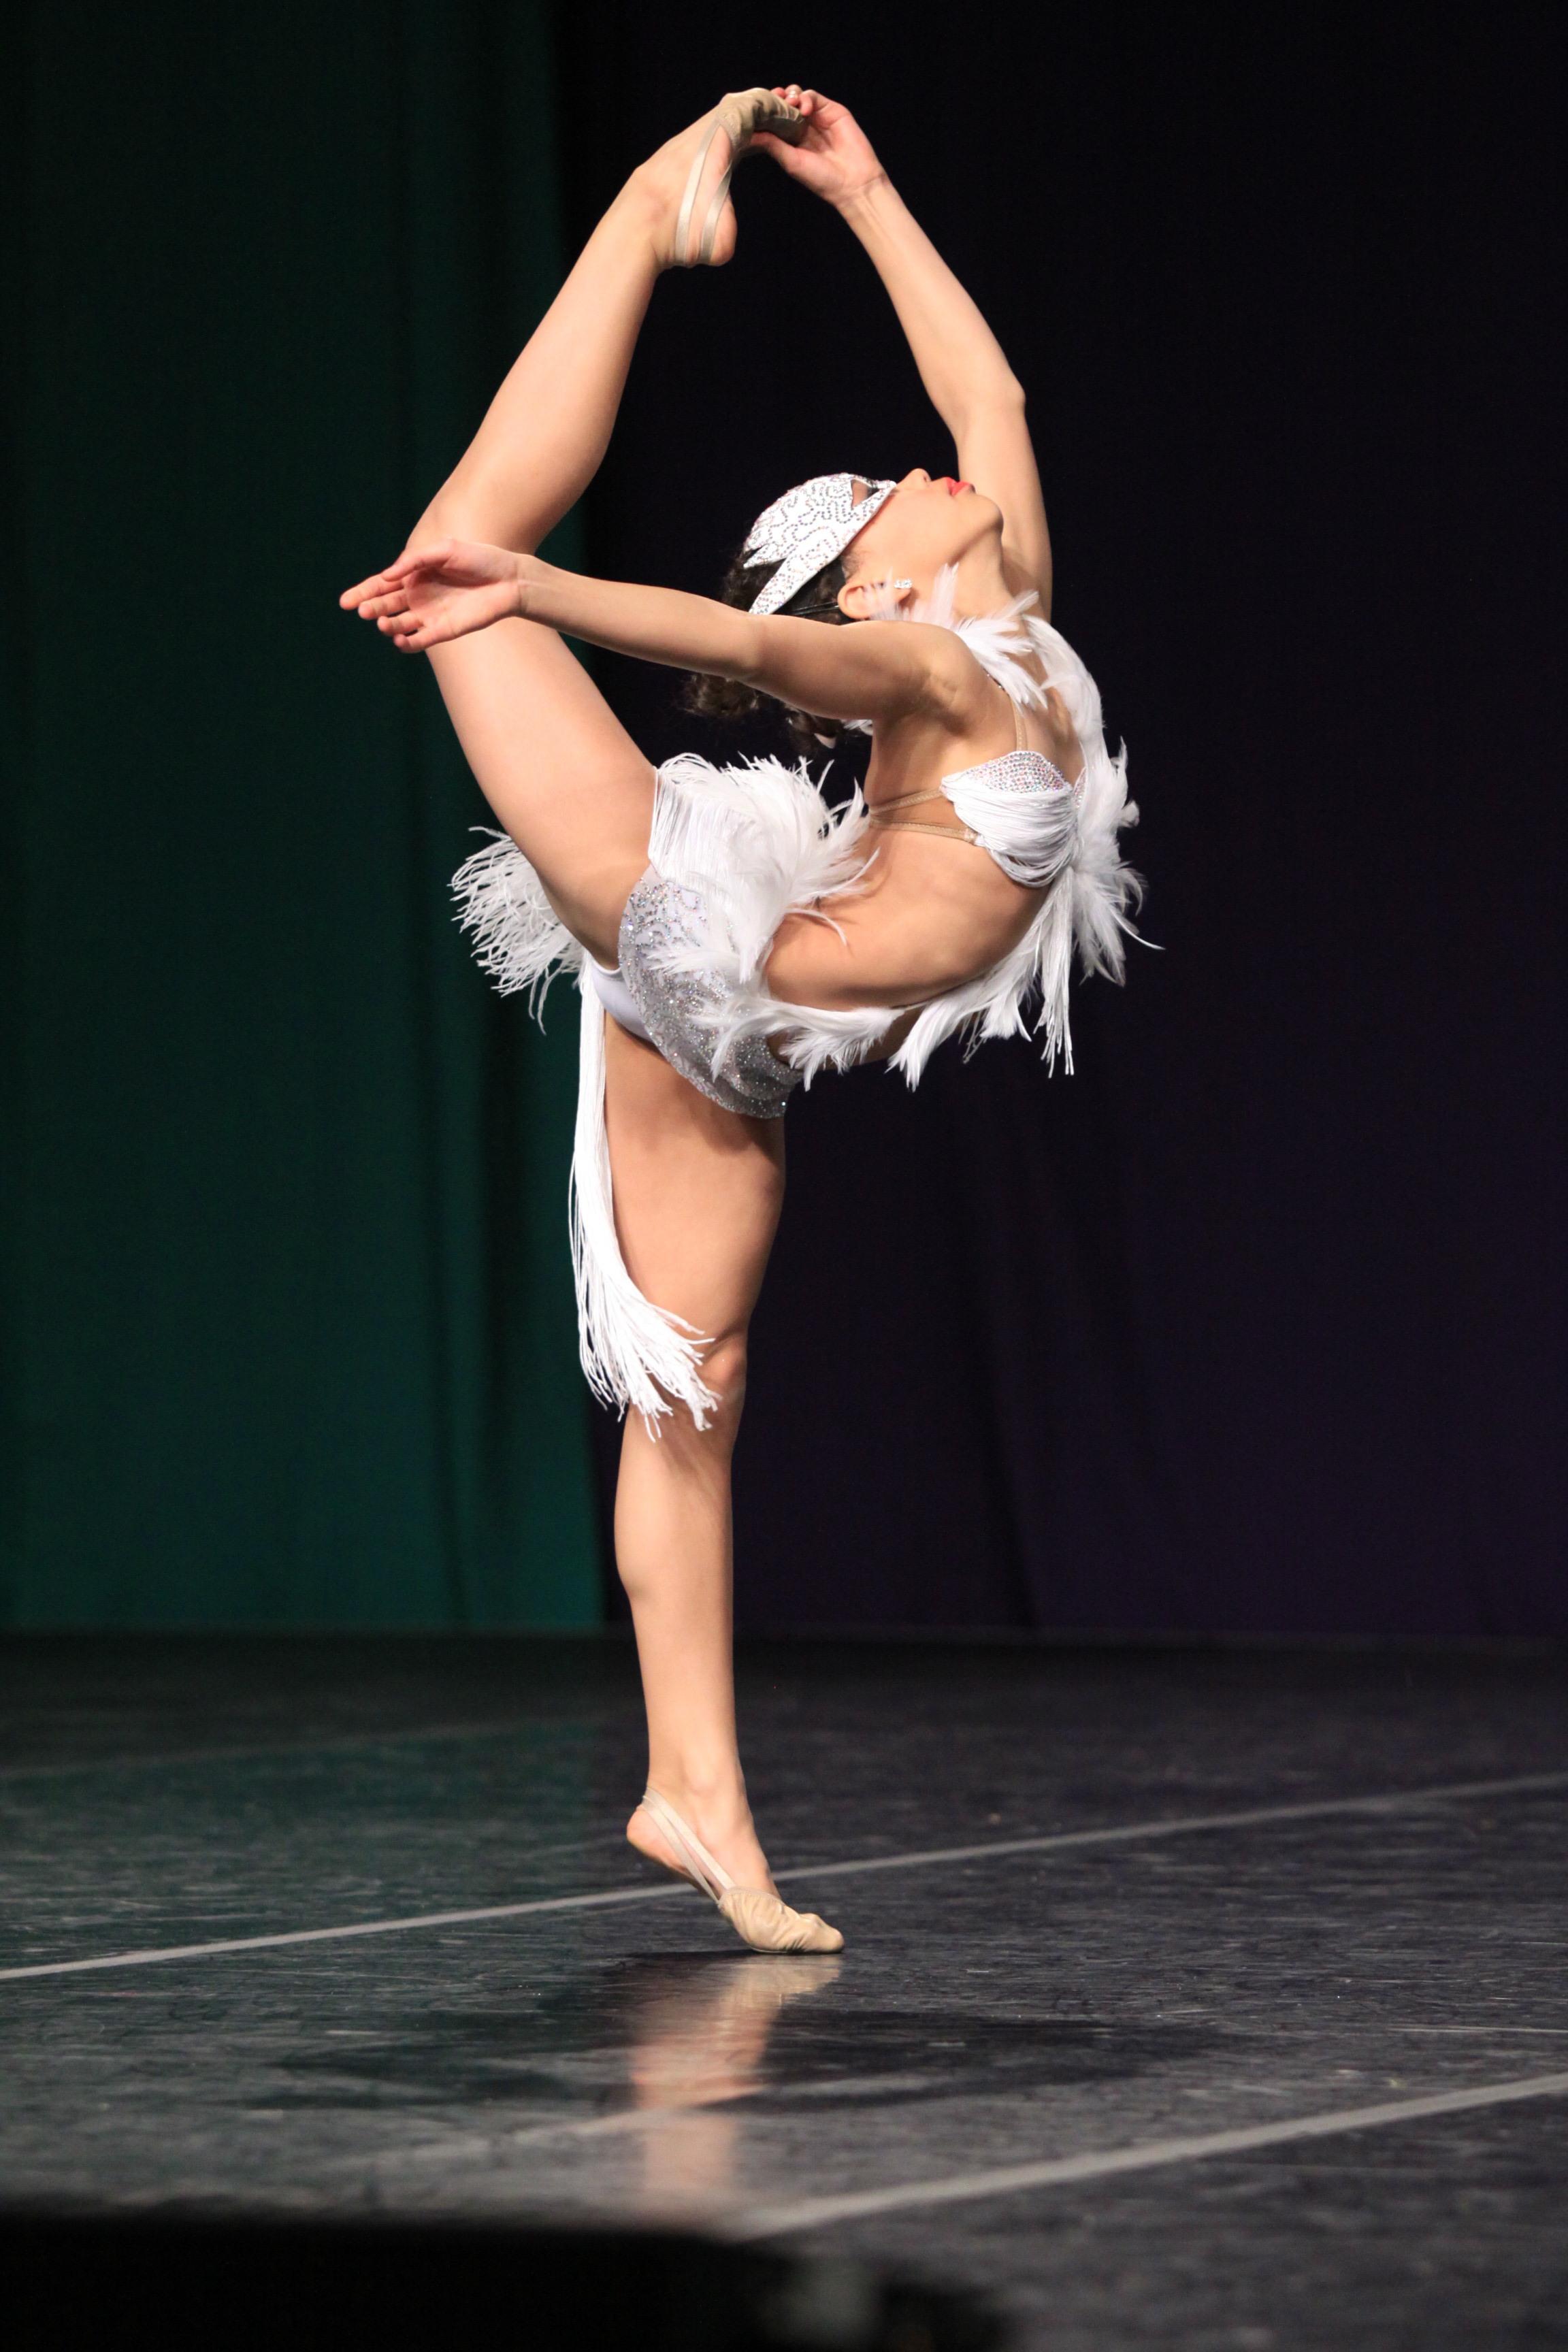 2010 - Malia Oliver from Energy Dance Center